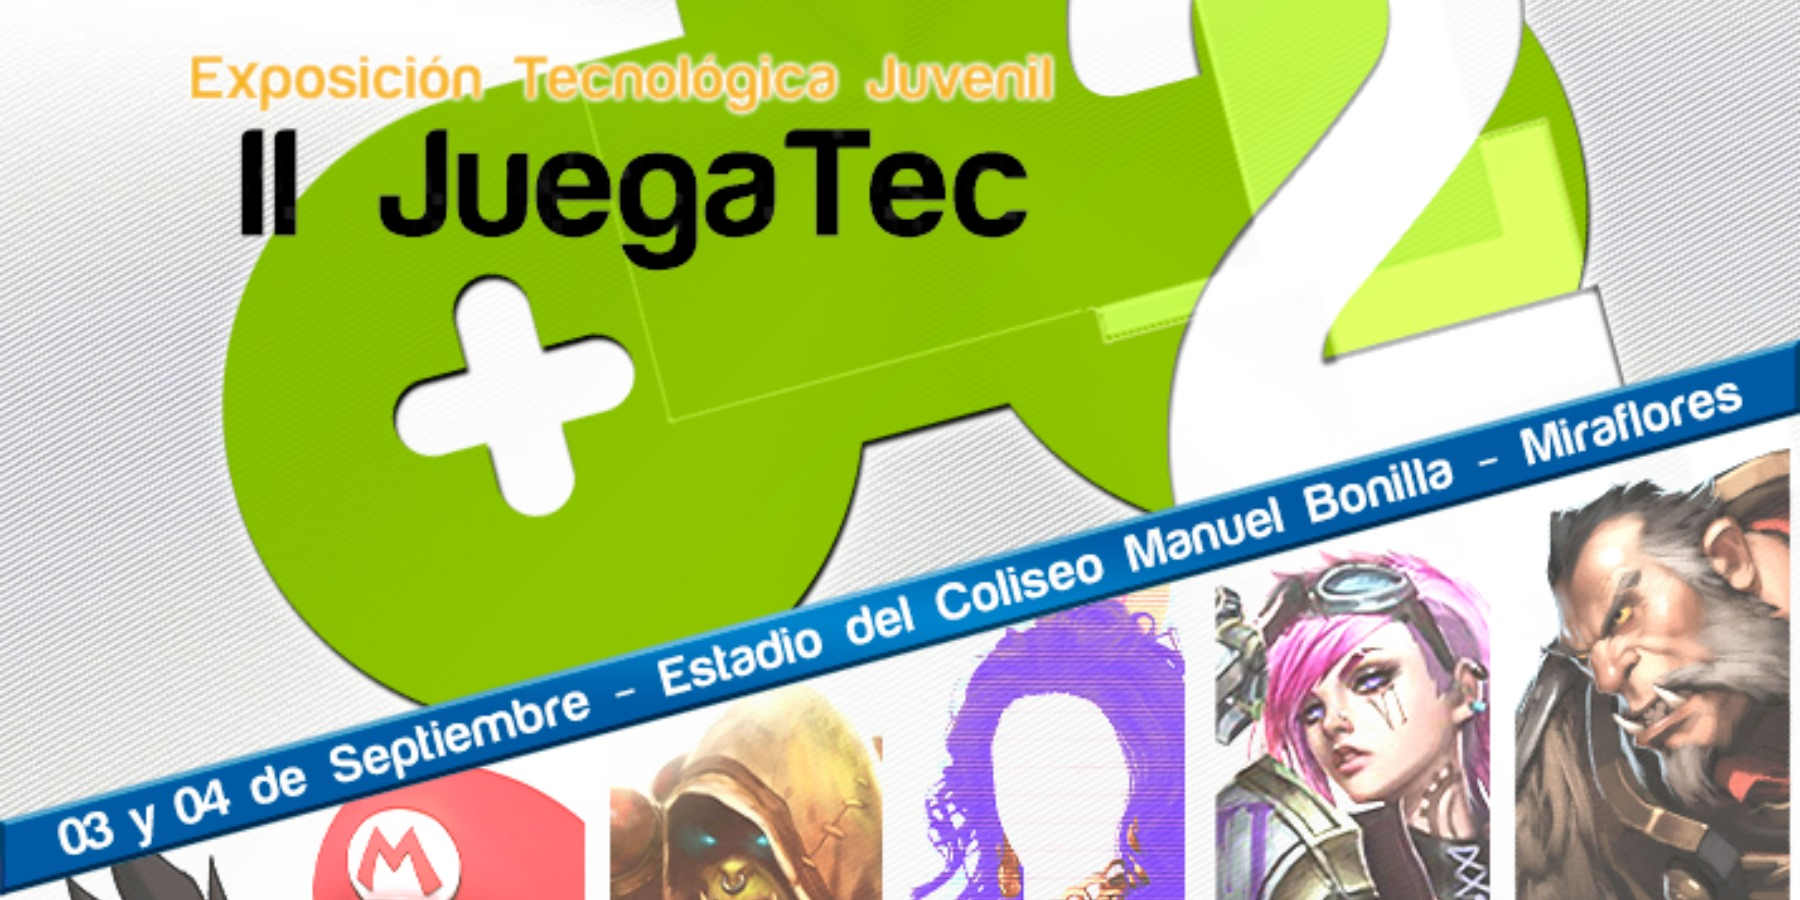 II JuegaTec | Coliseo Manuel Bonilla